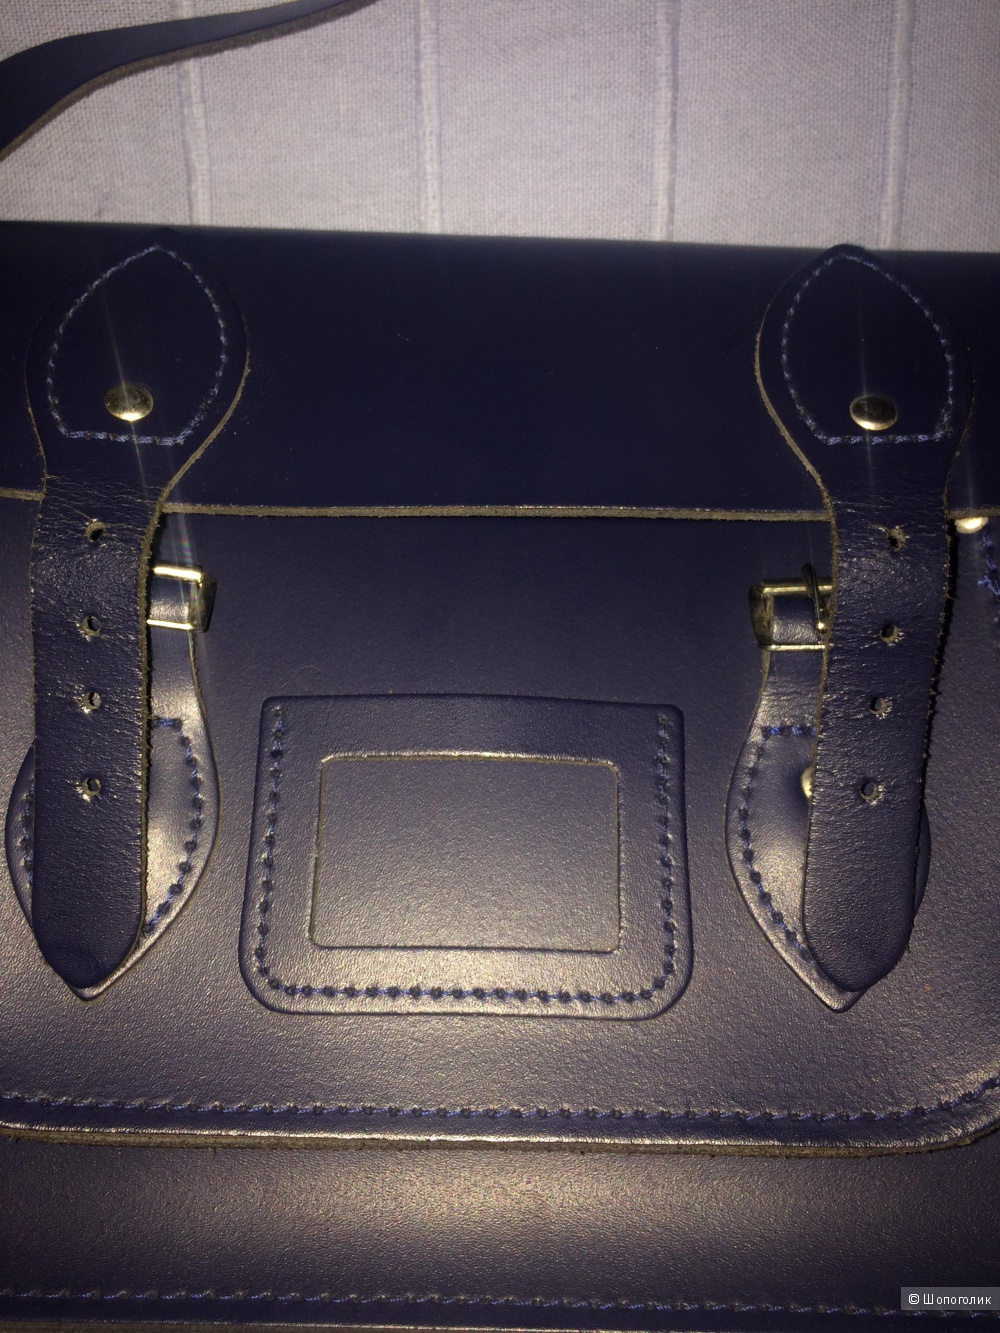 The leather satchel co темно синий 12.5